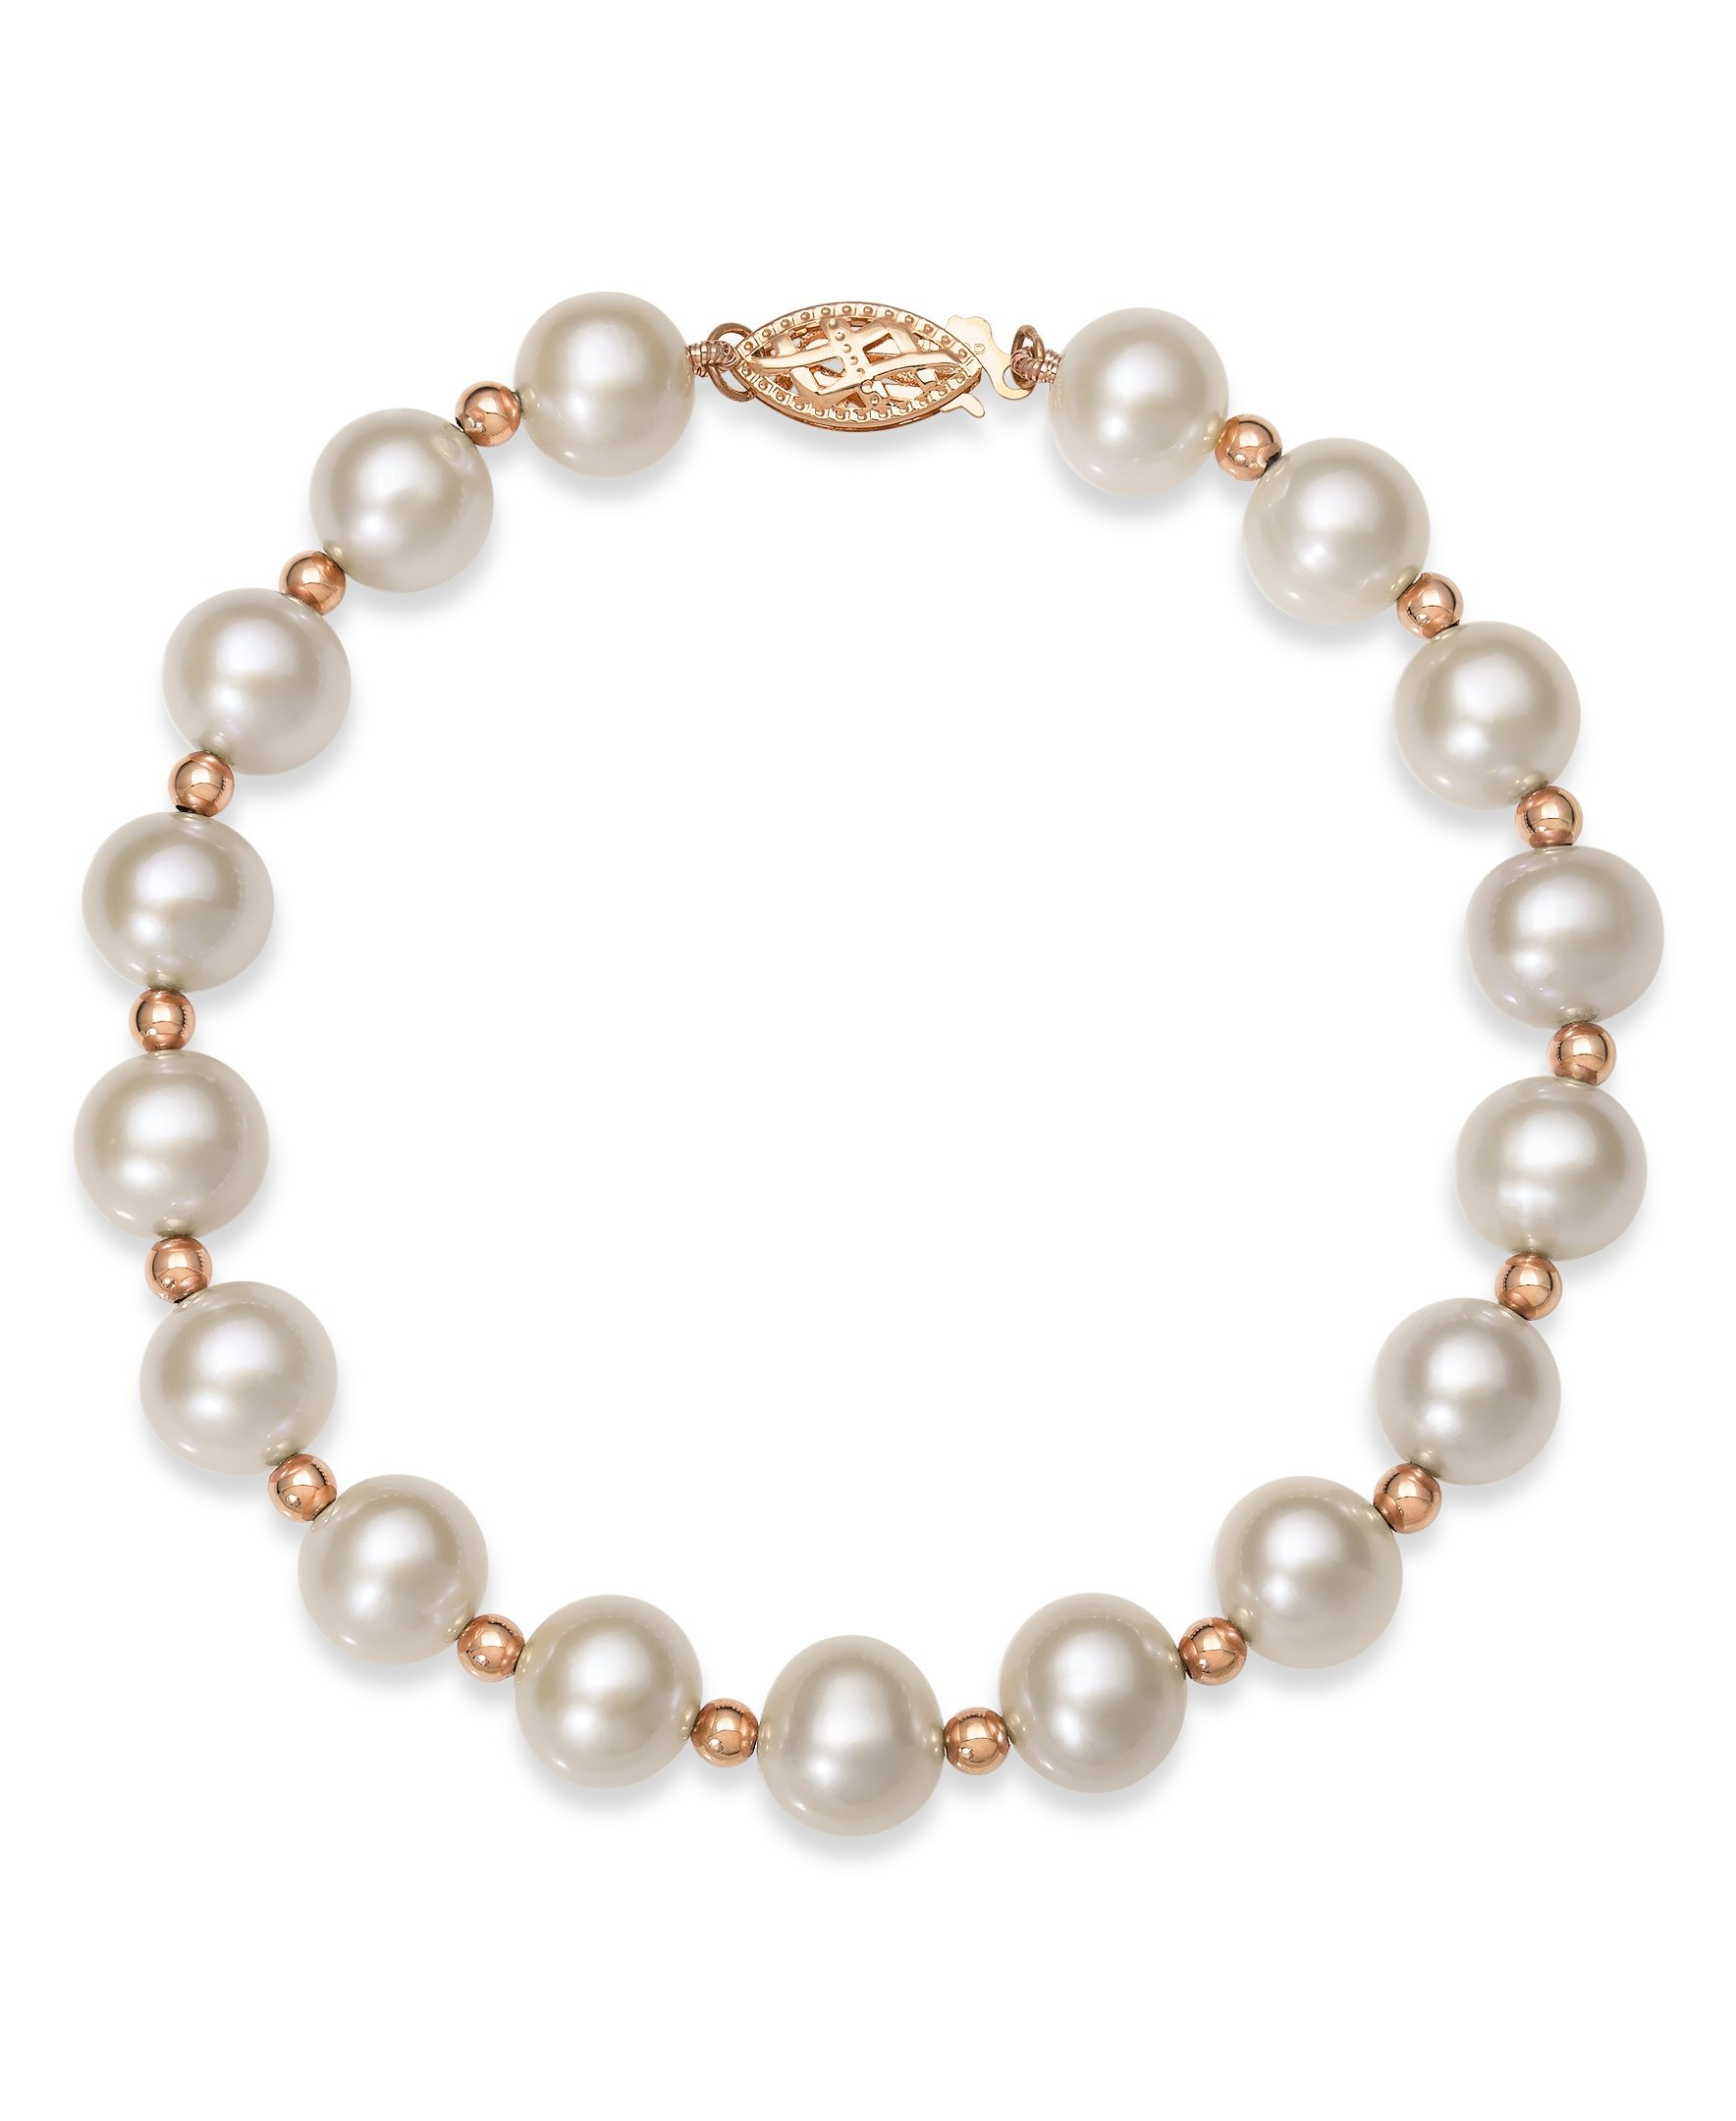 14K Rose Gold Cultured Freshwater Pearl Beaded Bracelet,7.5''